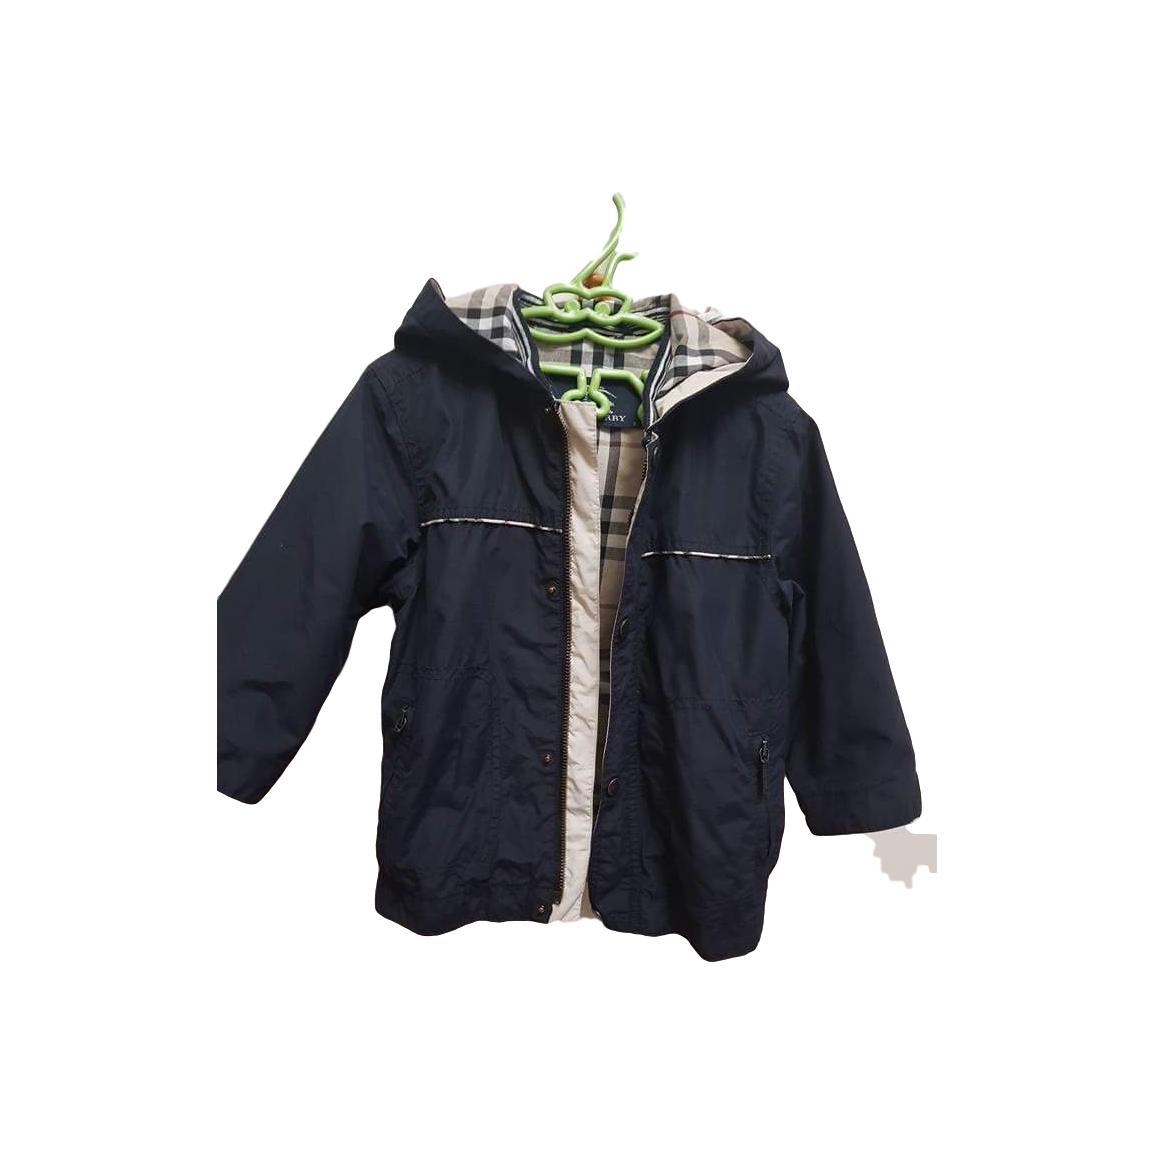 da462590ff5e Детская одежда для Мальчиков   Куртки Burberry купить на Luxxy.com ...